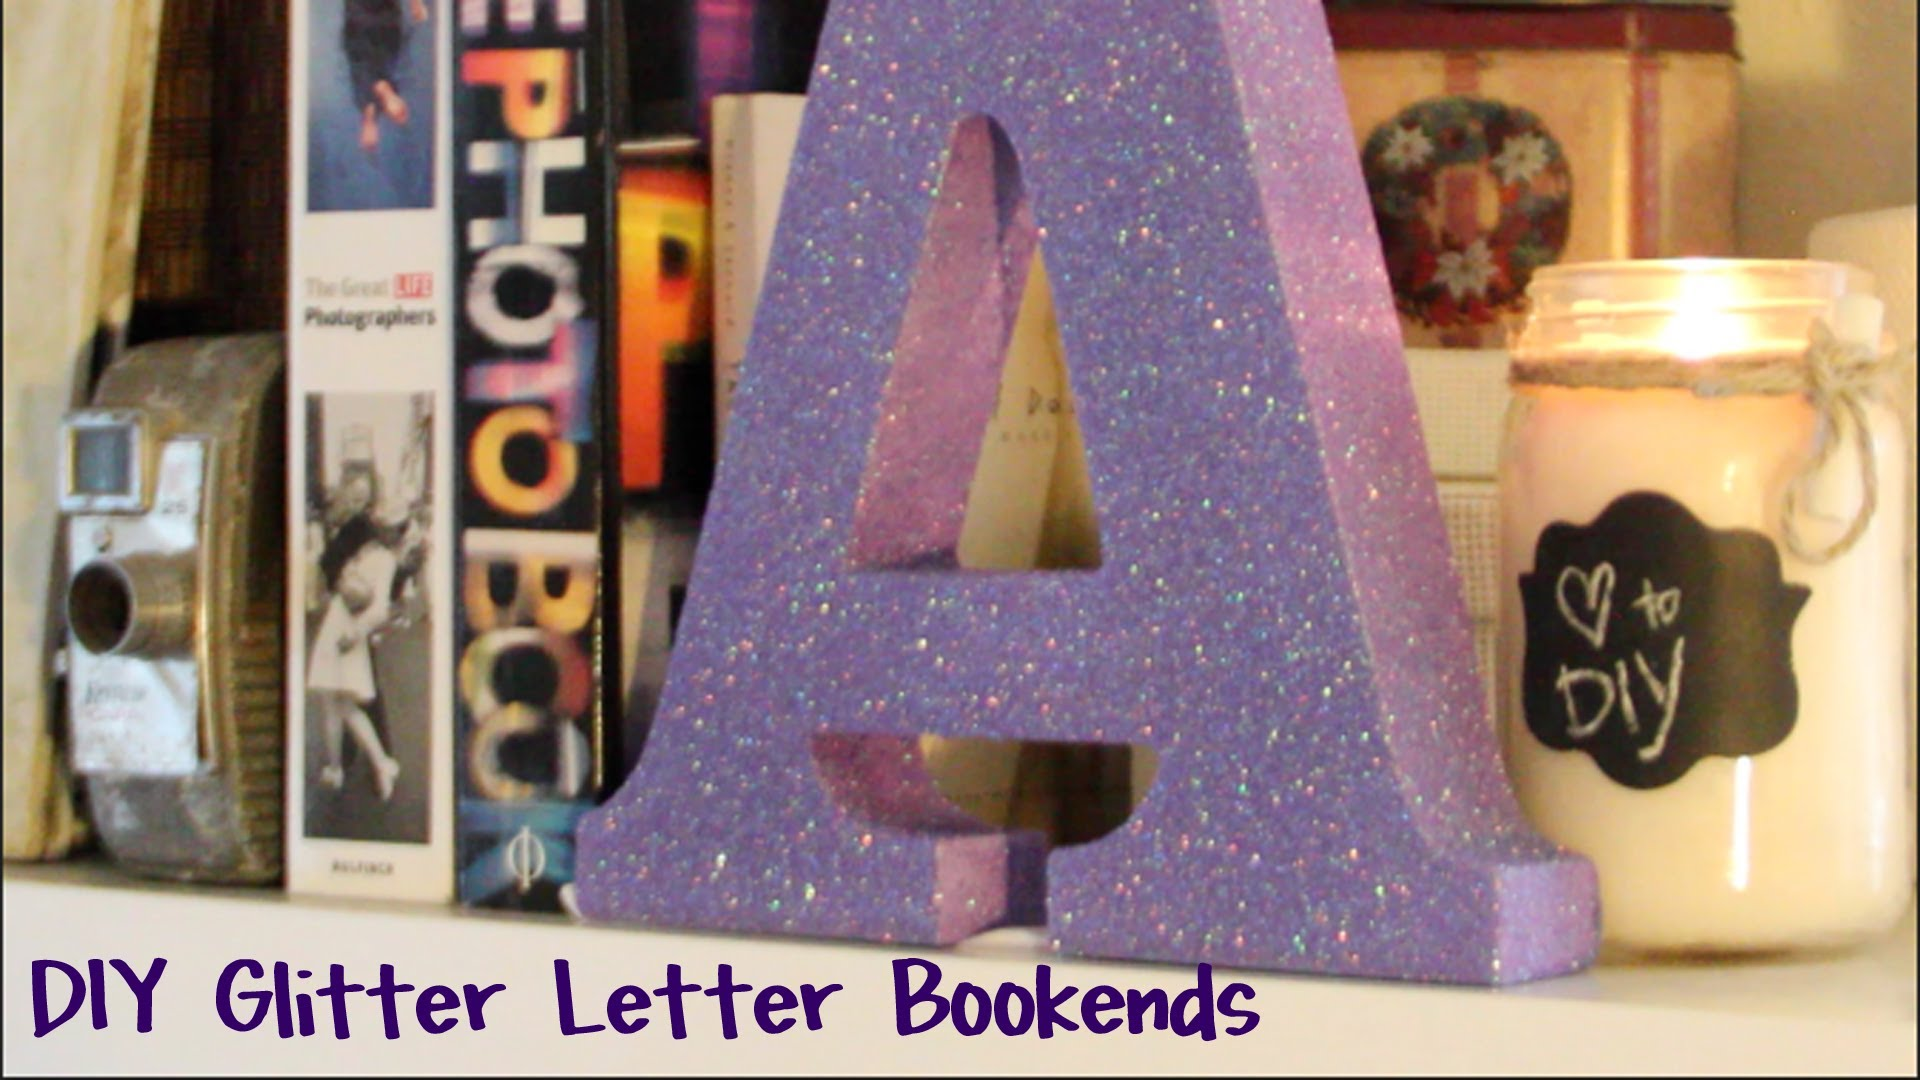 Diy Glitter Bookends Bookends Diy Glitter Easy Glitter Letters Glitter Diy Diy Letters